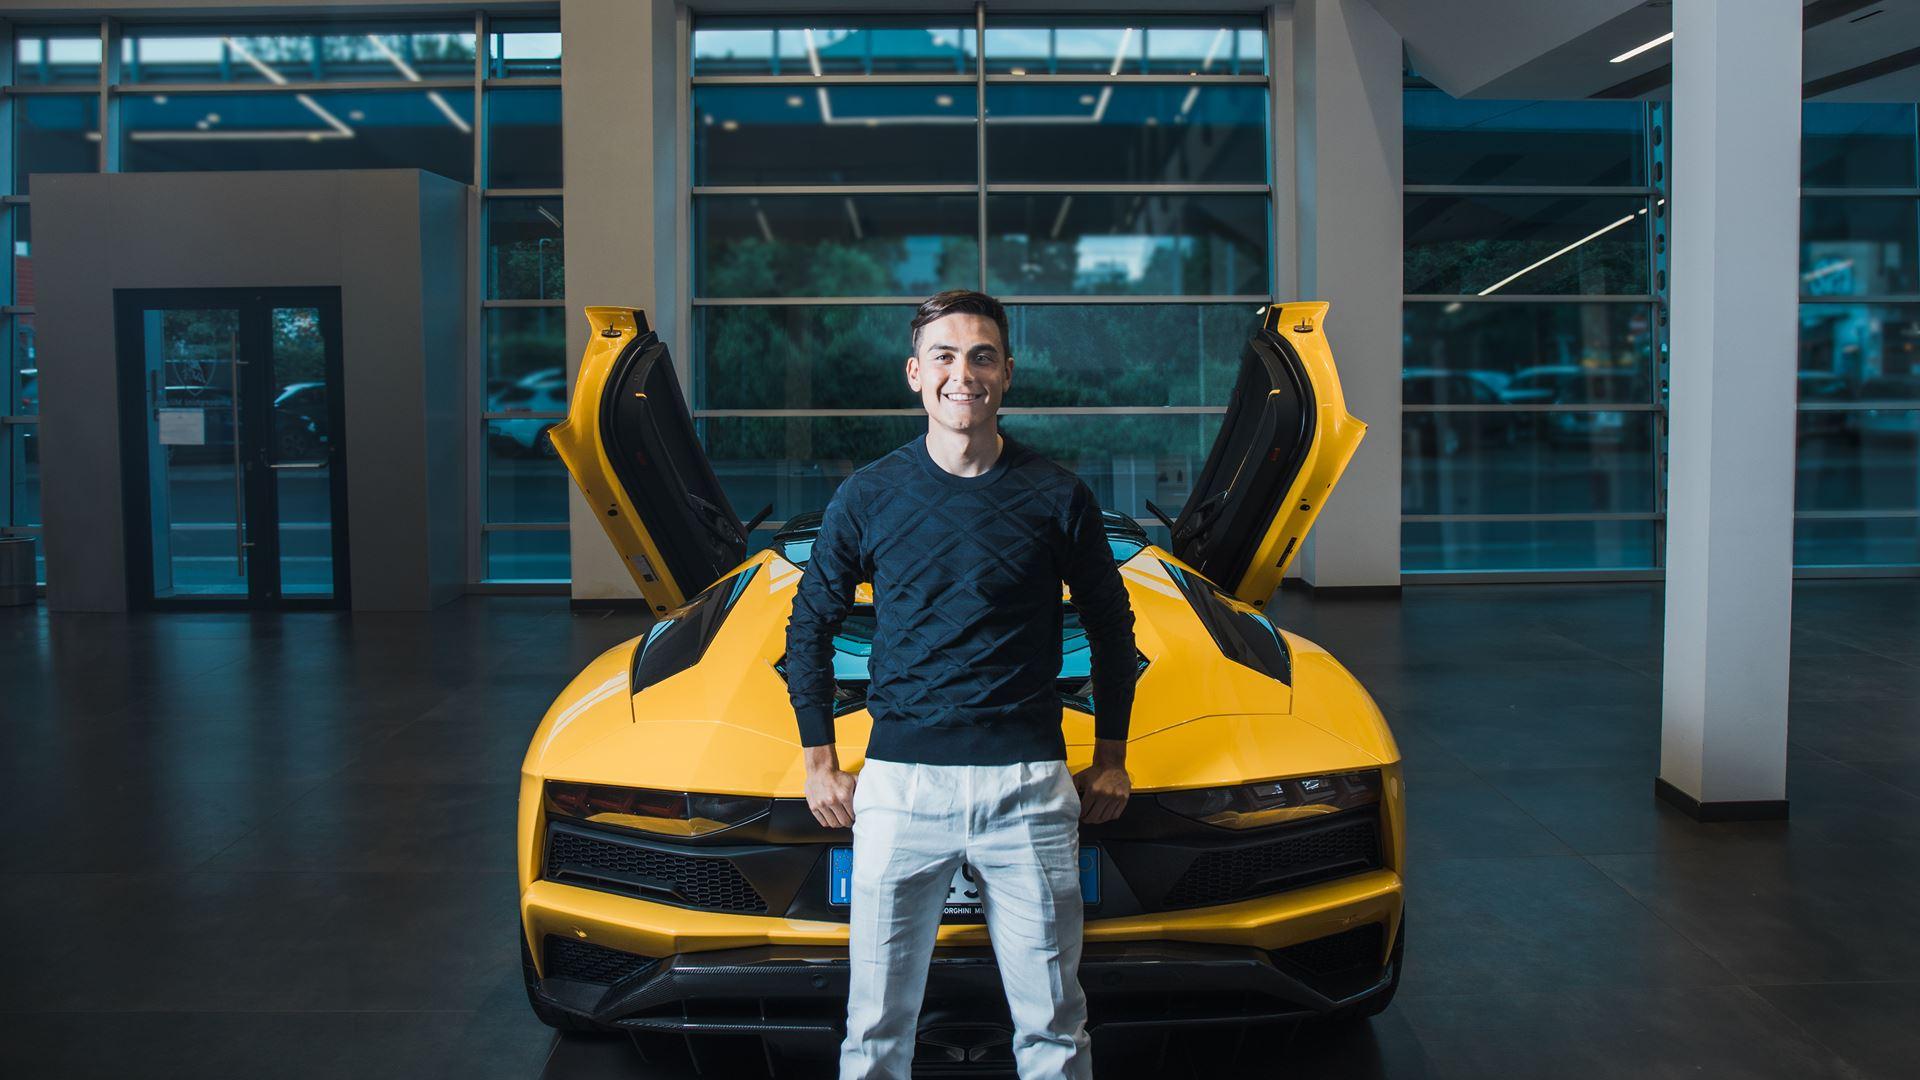 Football Star Paulo Dybala Celebrates 100th Goal with a New Lamborghini - Image 1